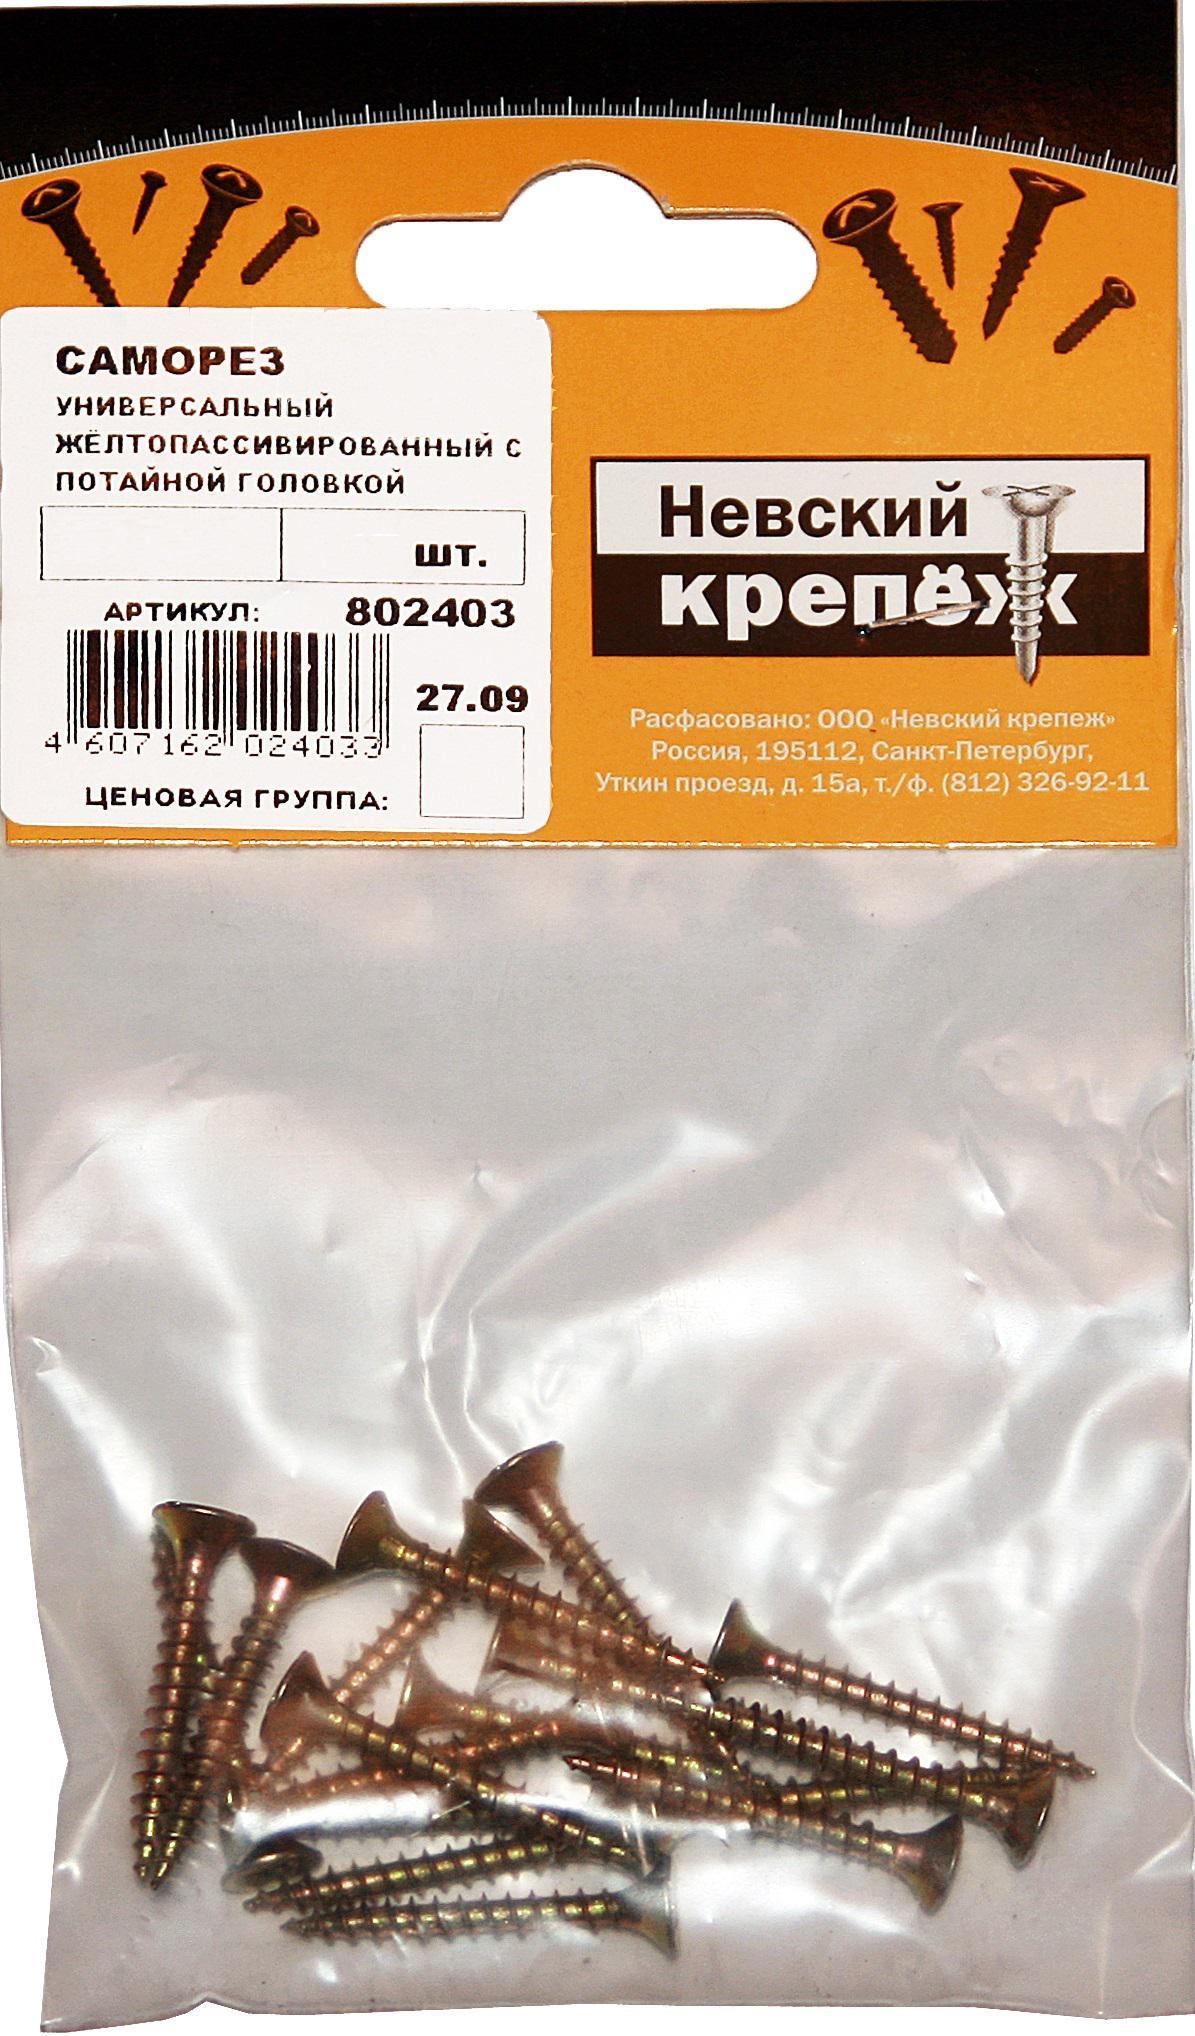 Саморез НЕВСКИЙ КРЕПЕЖ 802386